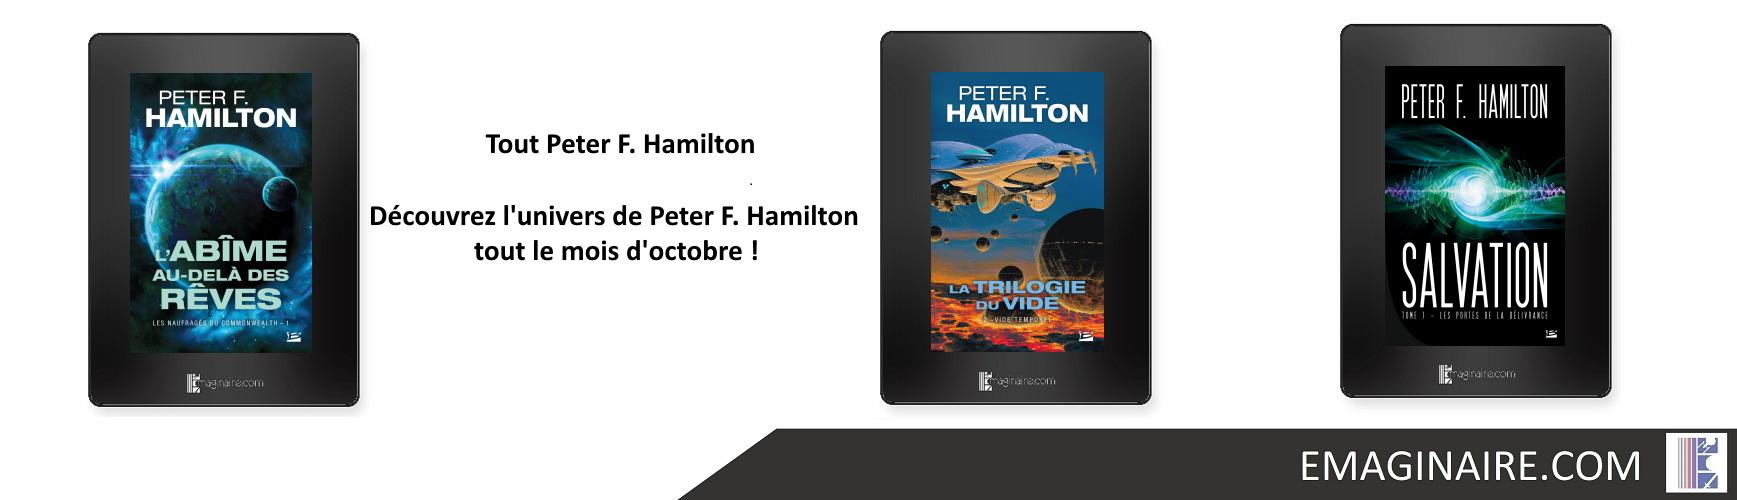 Tout Peter F. Hamilton